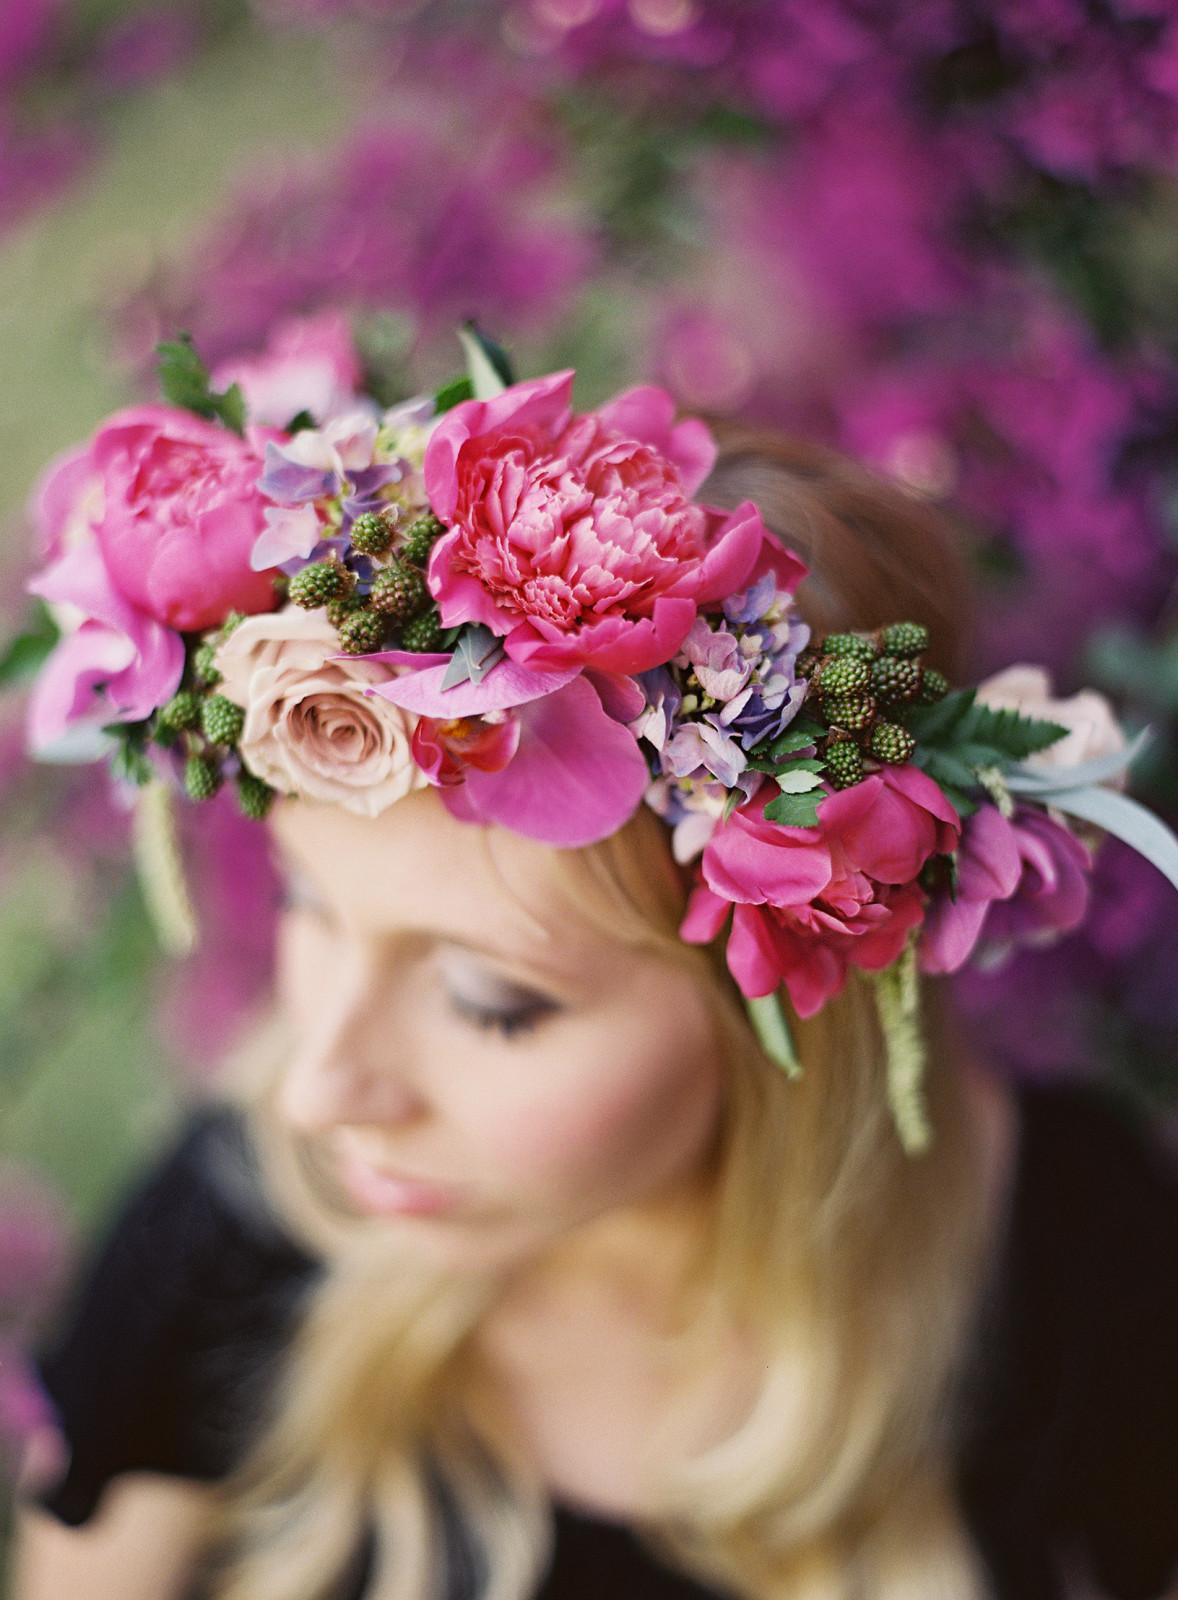 Sydney-Wedding-Photographer-Love-Note-Chanele-Rose-Flowers